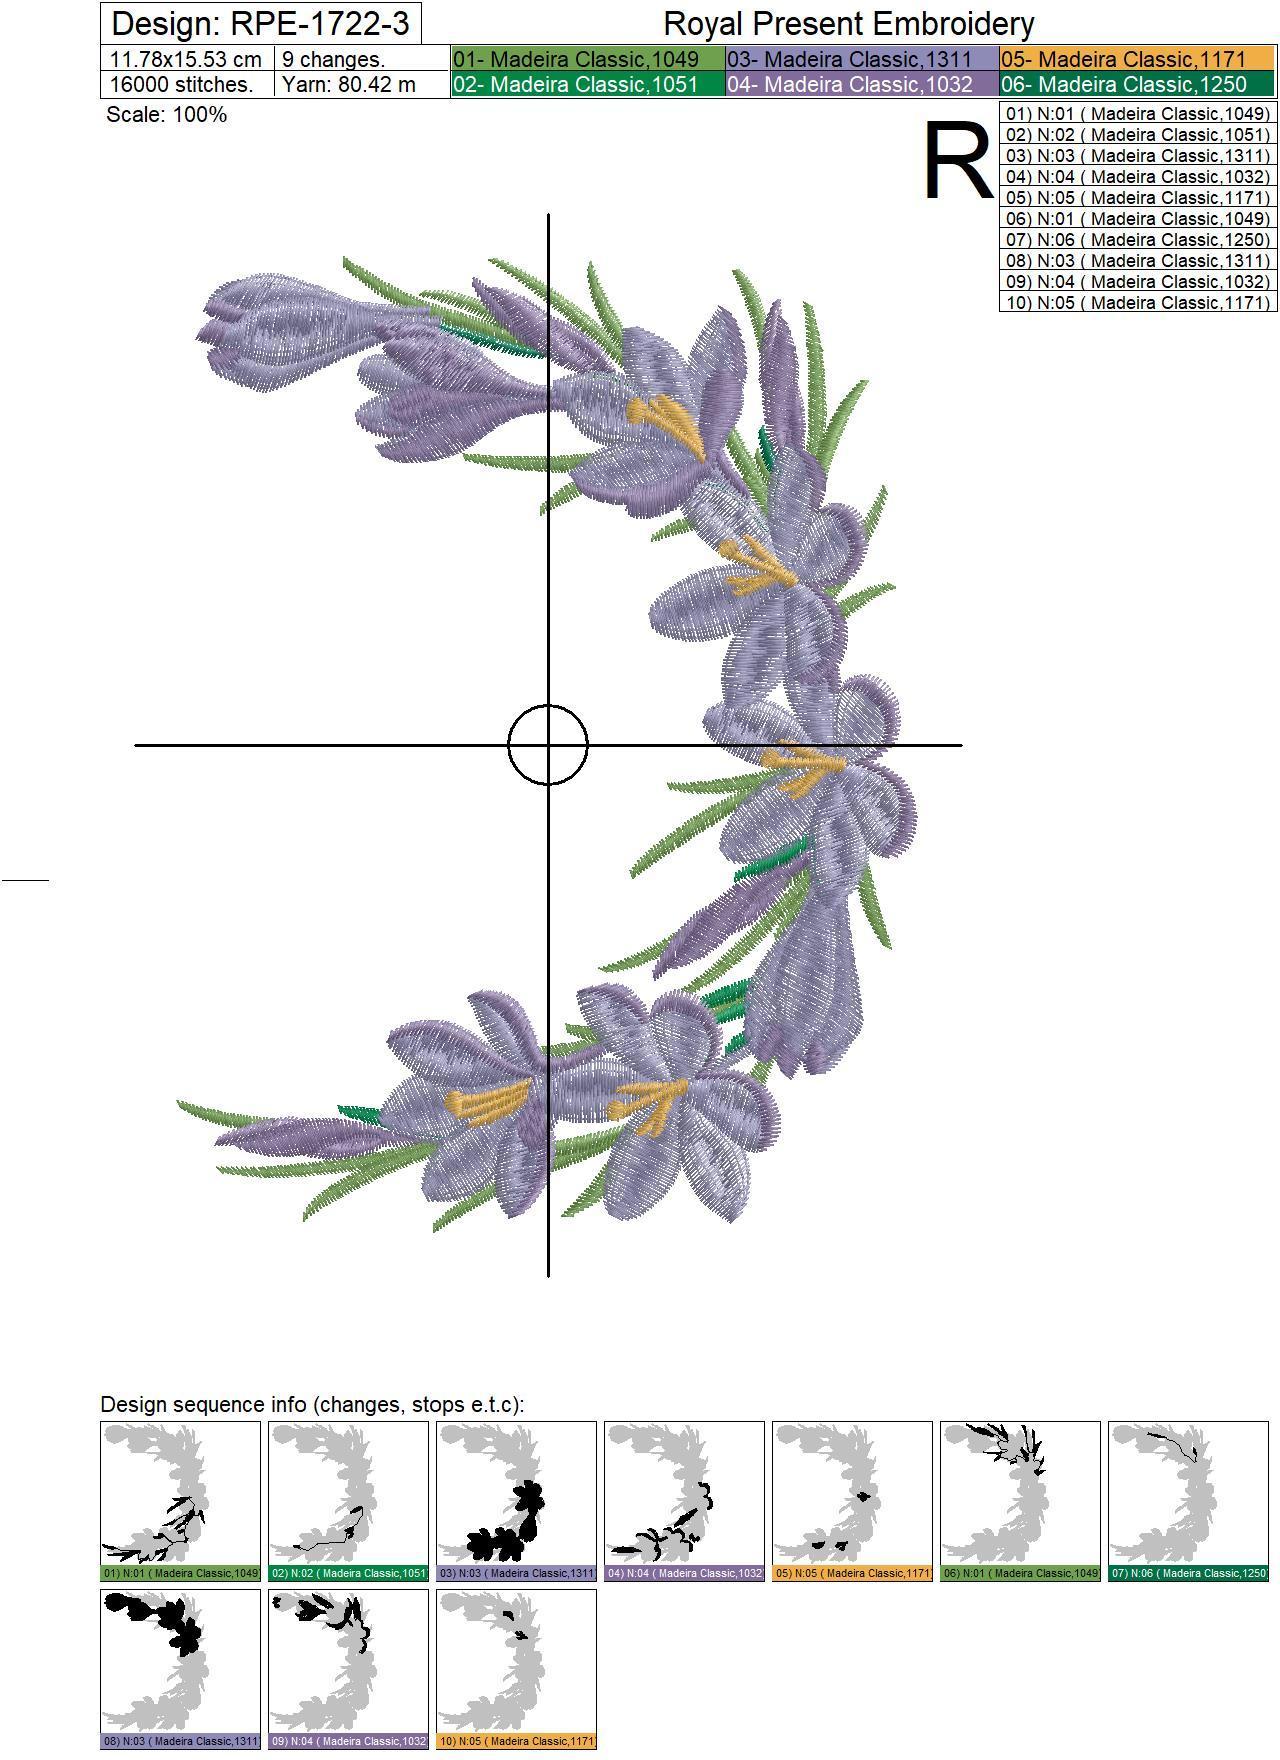 Crocuses Vignette Machine Embroidery Design - 3 sizes